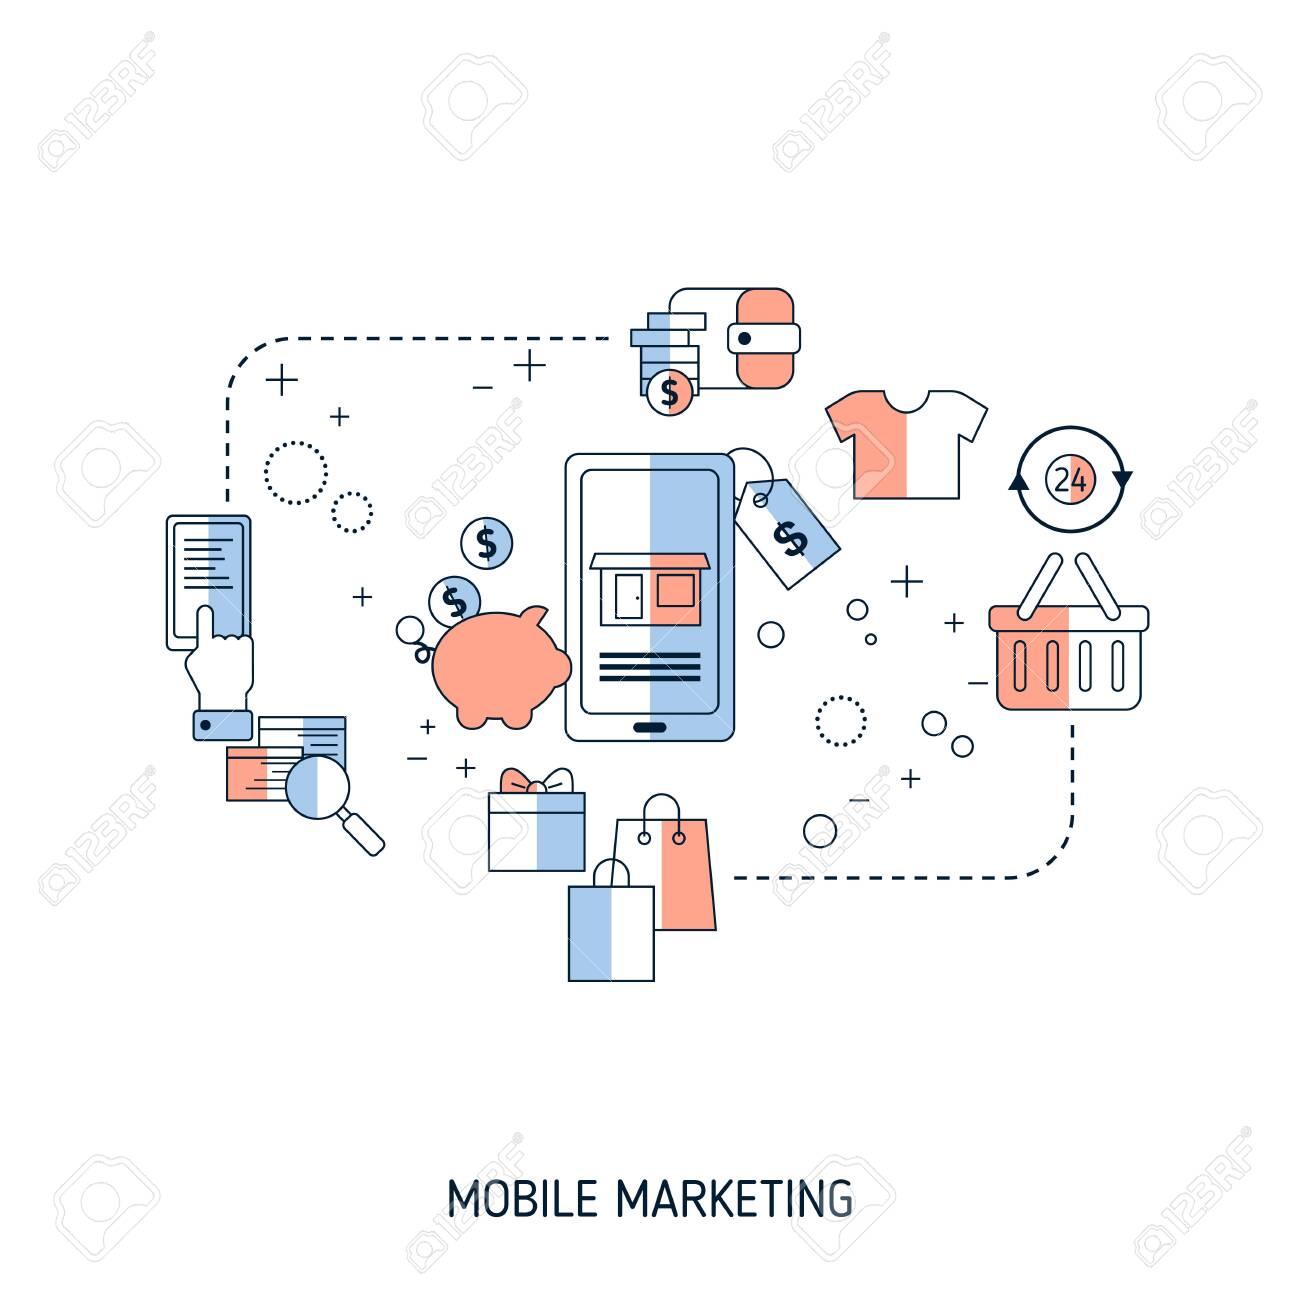 Mobile marketing concept. Vector illustration for website, app, banner, etc. - 146164748